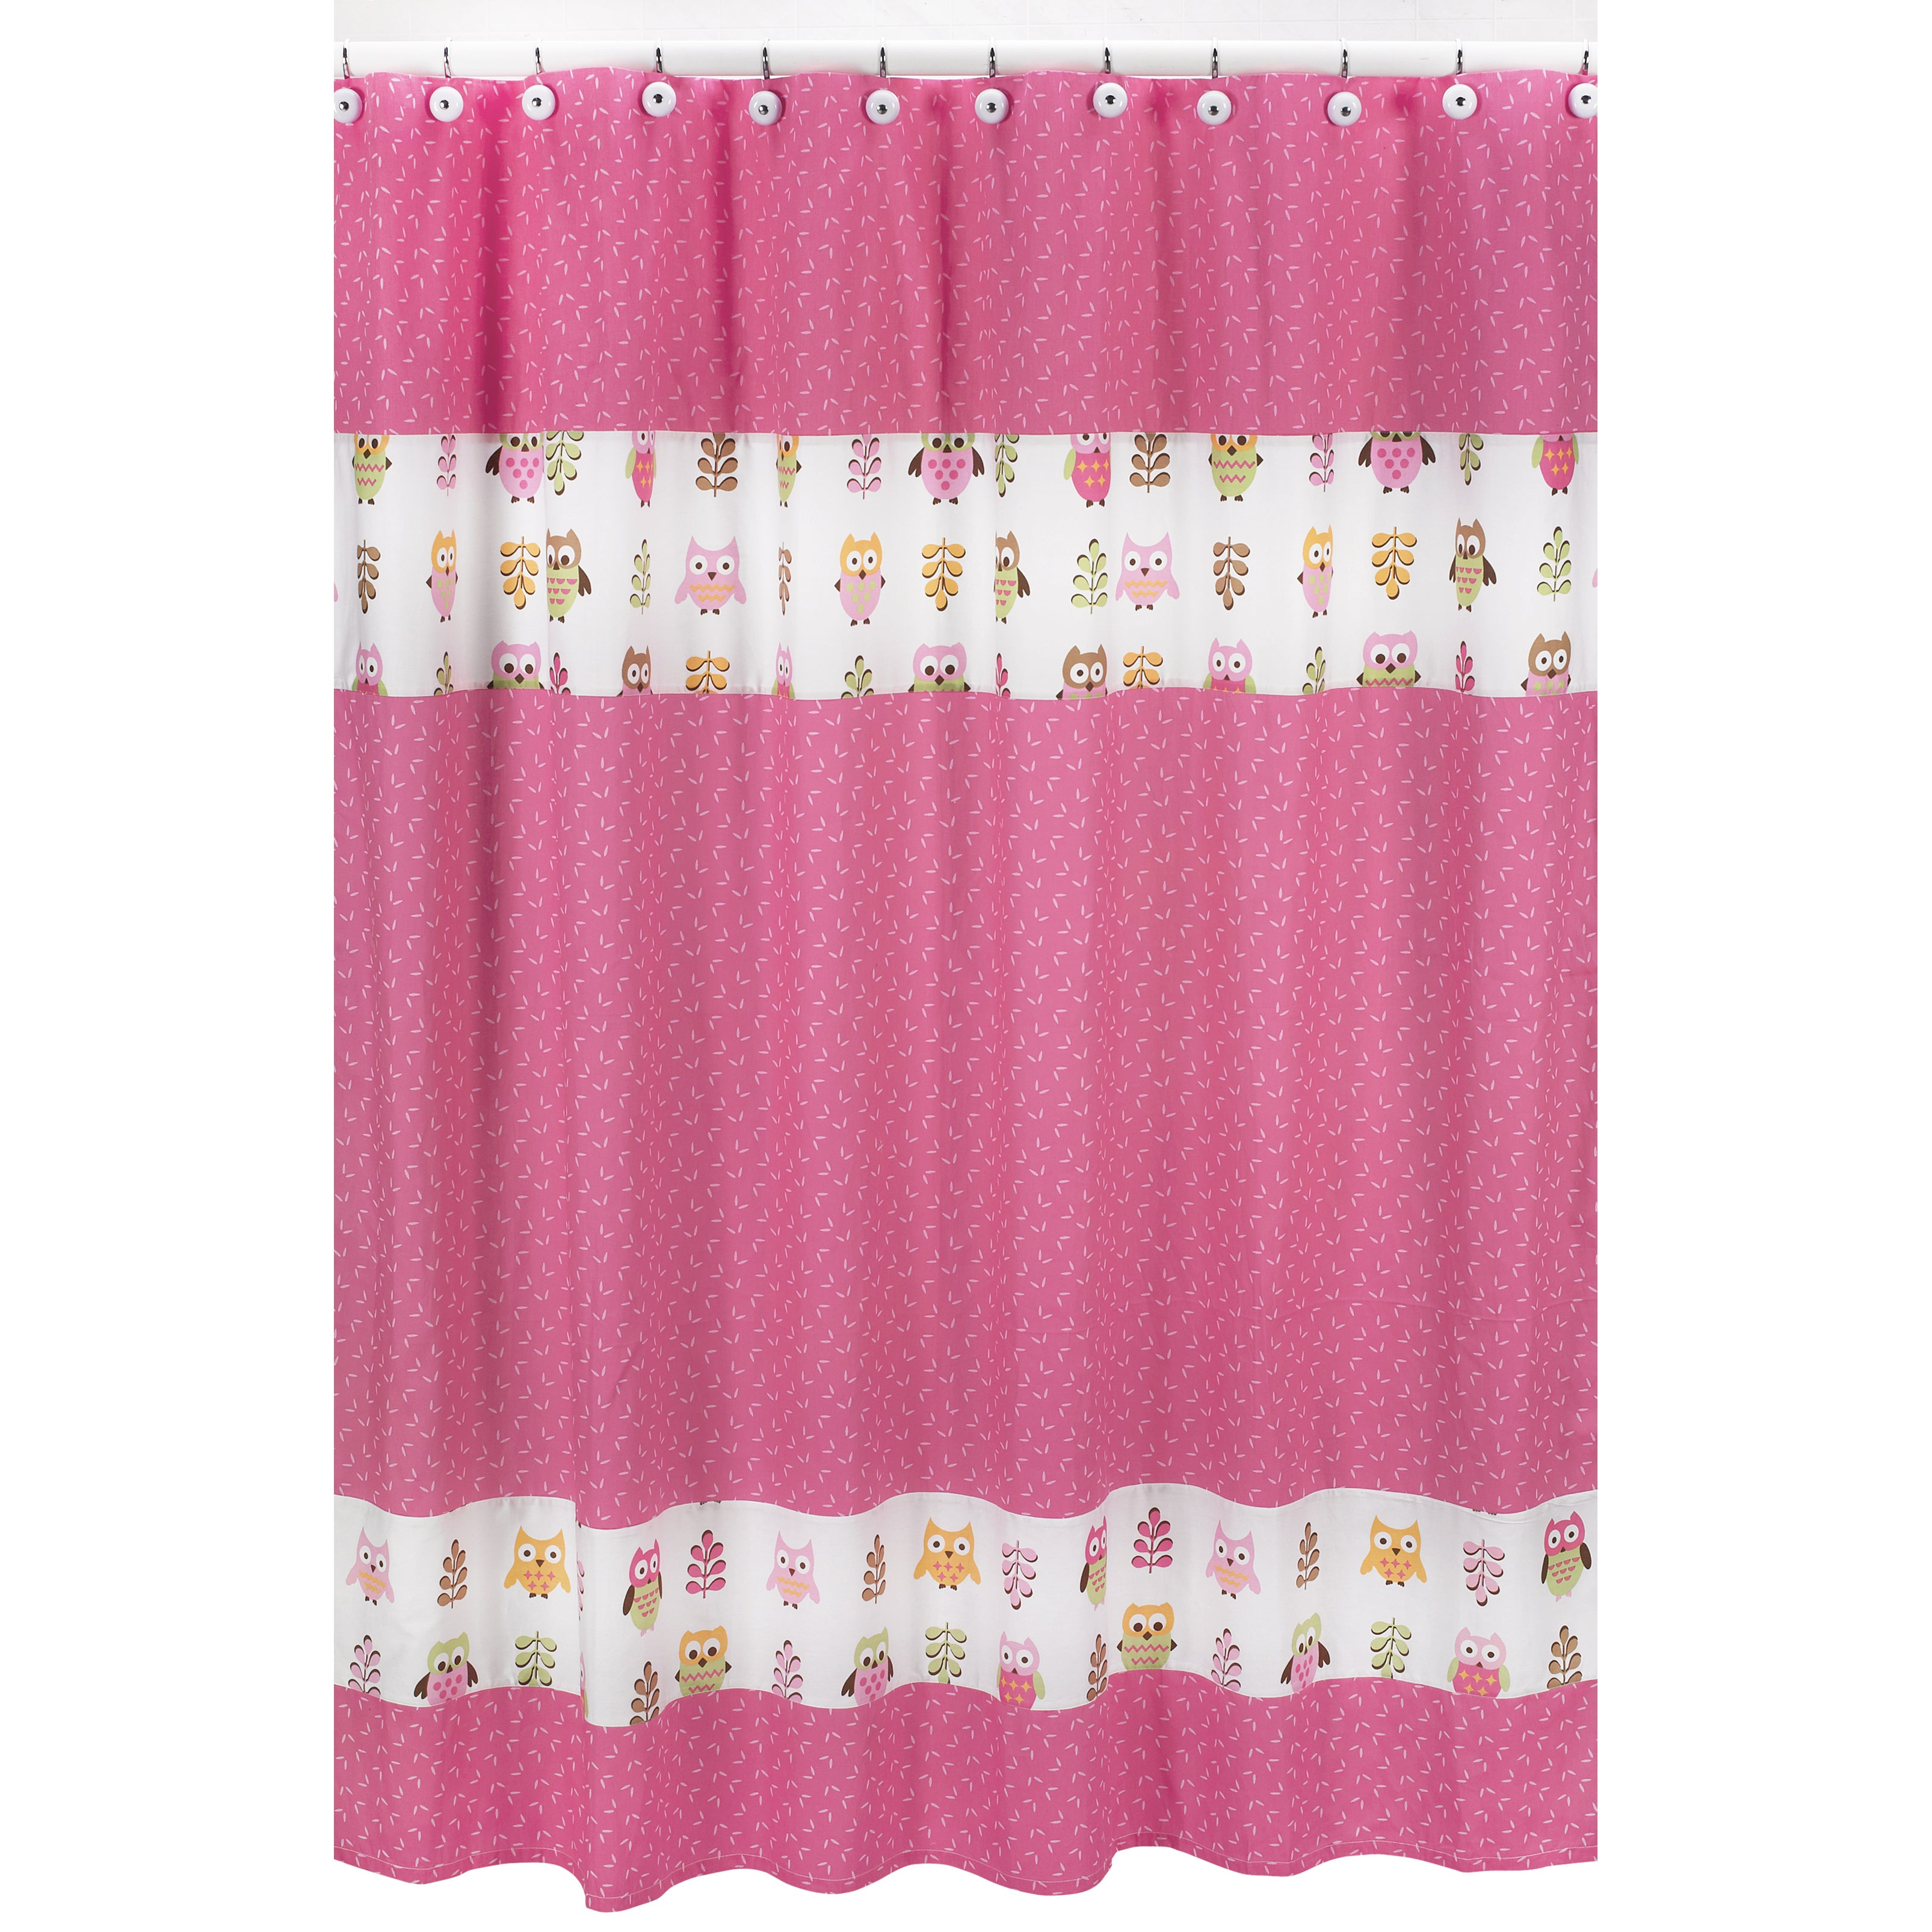 Sweet Jojo Designs Pink French Toile Kids Bathroom Fabric Bath Shower Curtain